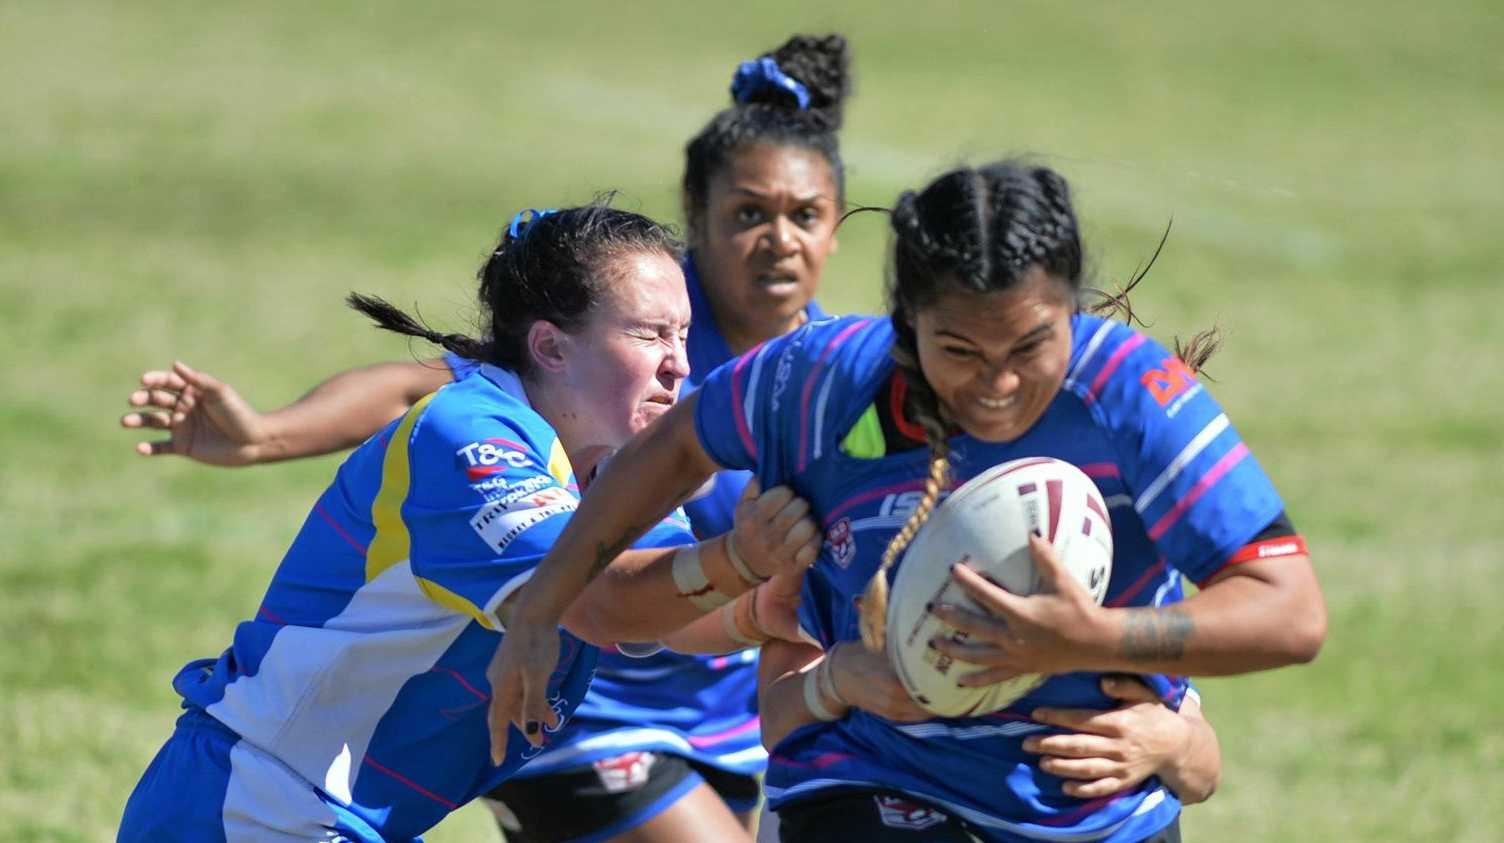 Moranbah v Souths Sharks RLM women's semifinal.